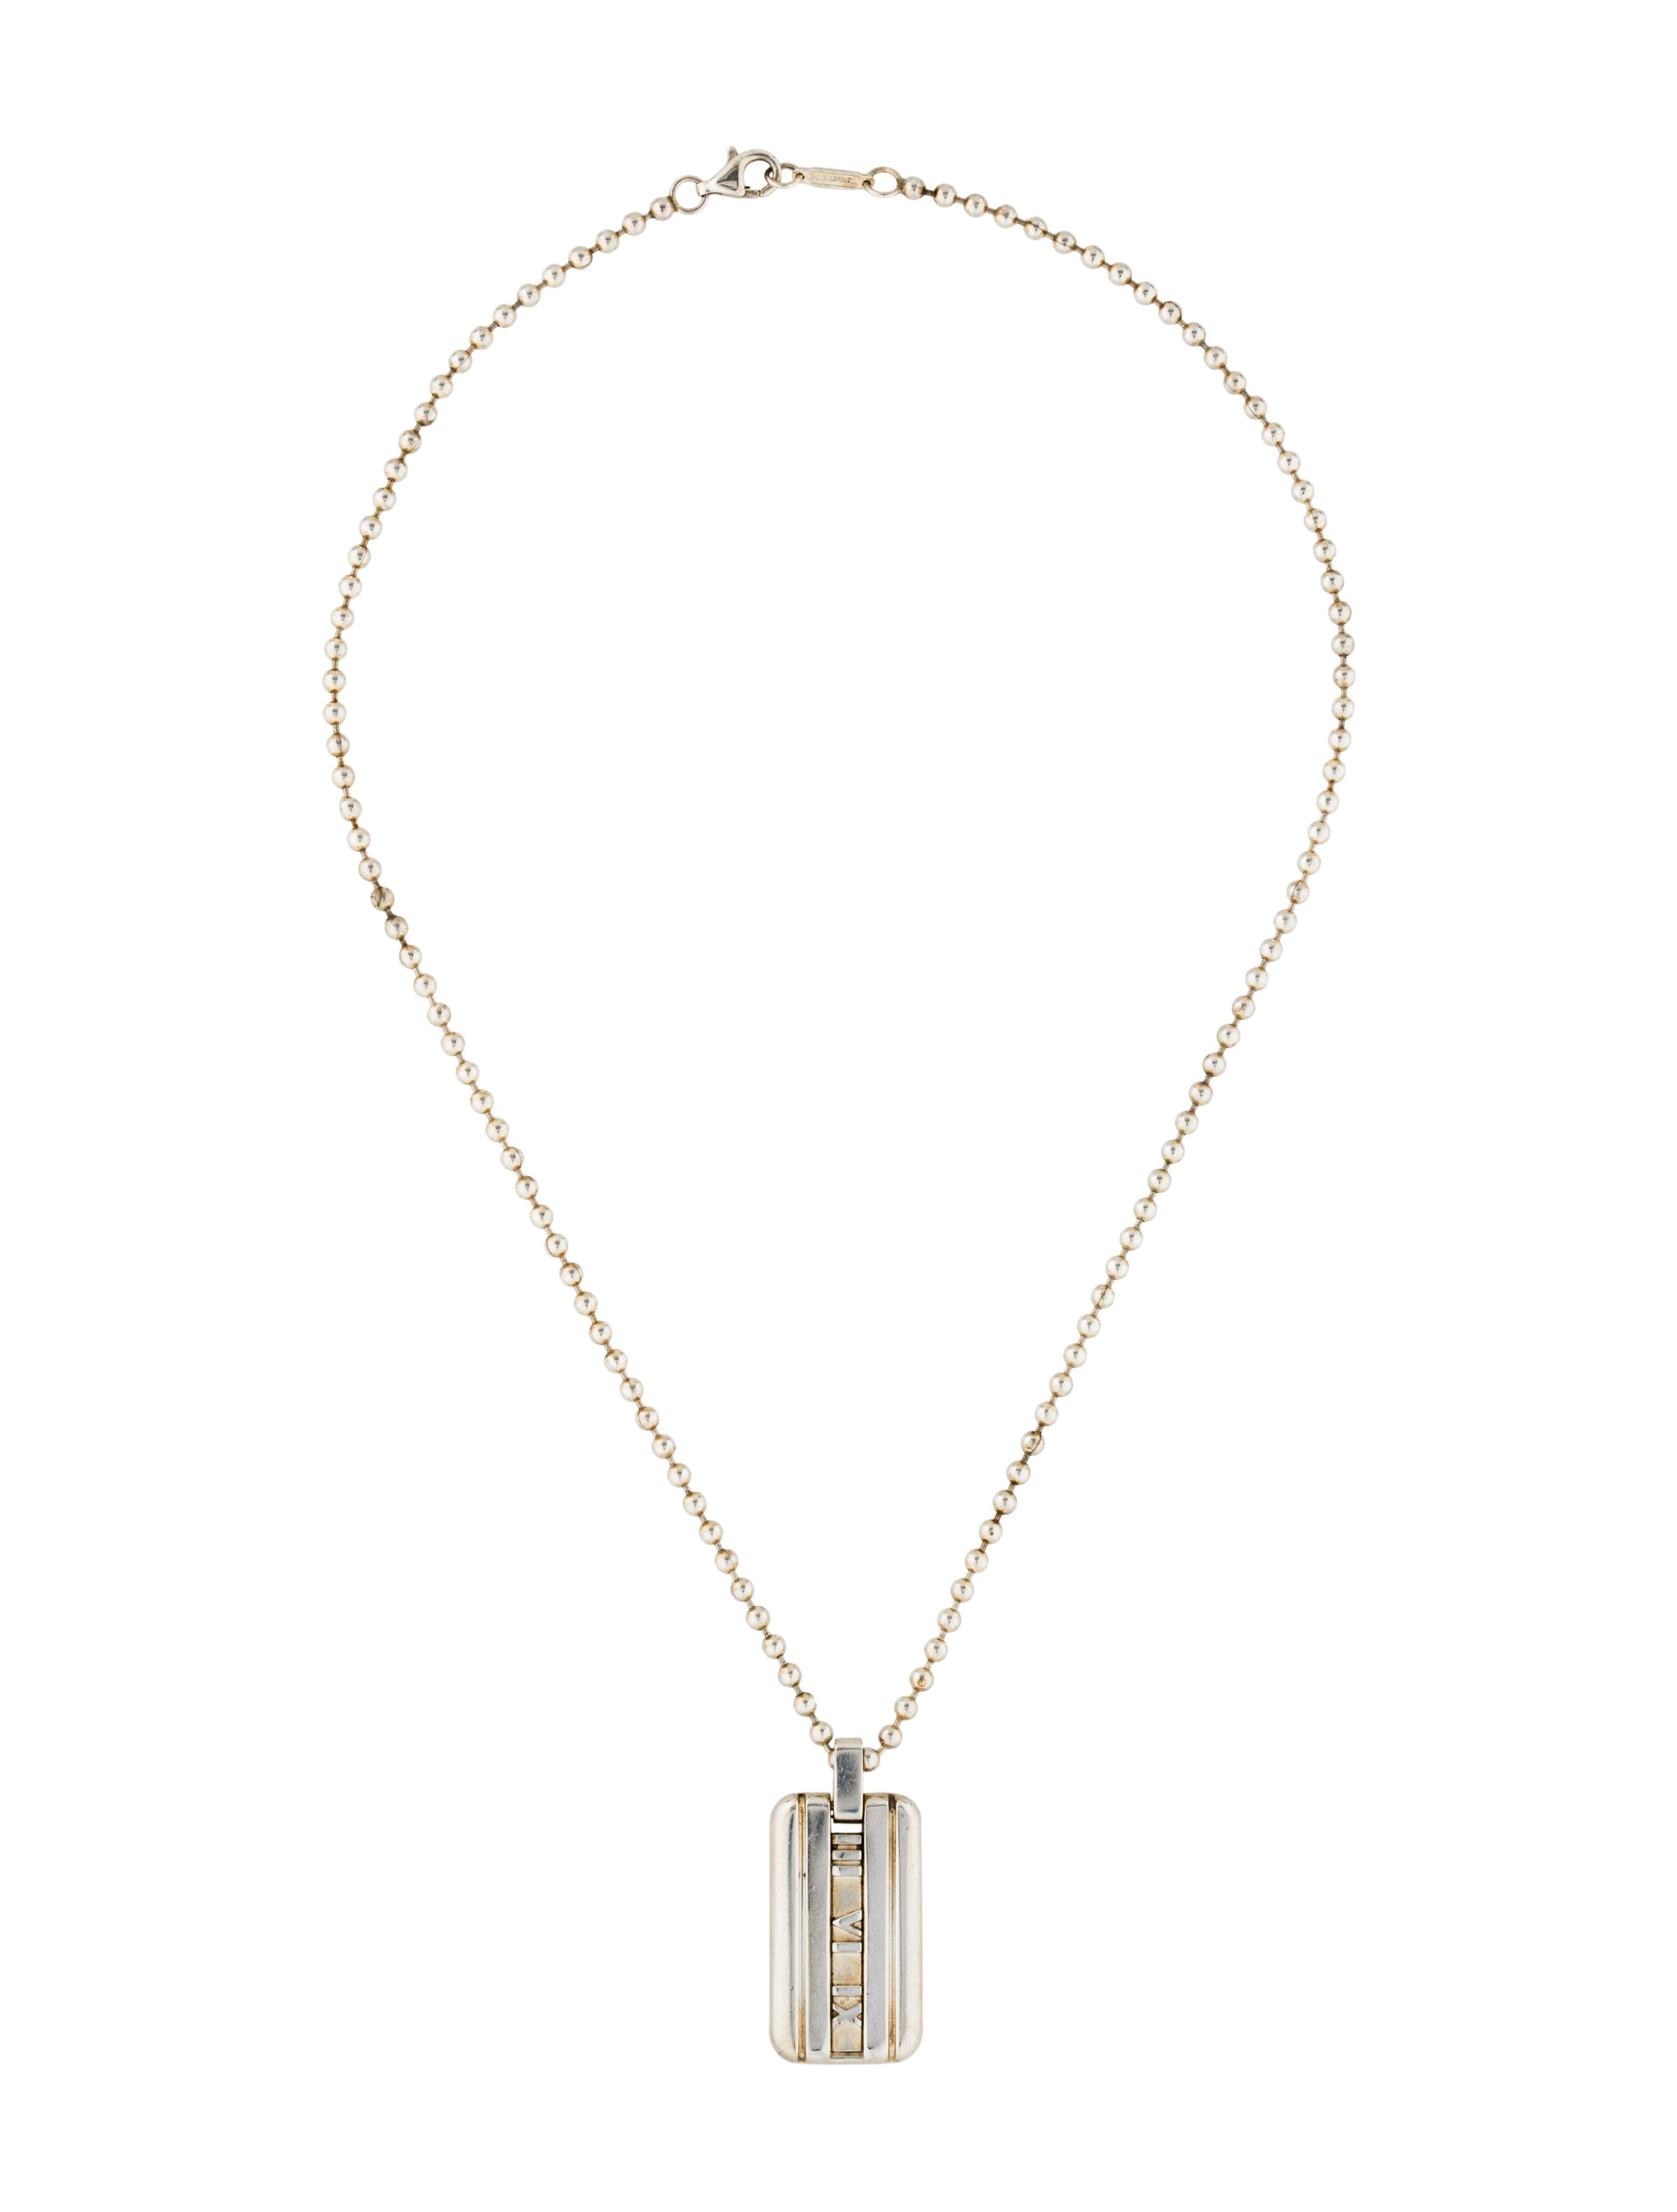 co atlas tag pendant necklace necklaces